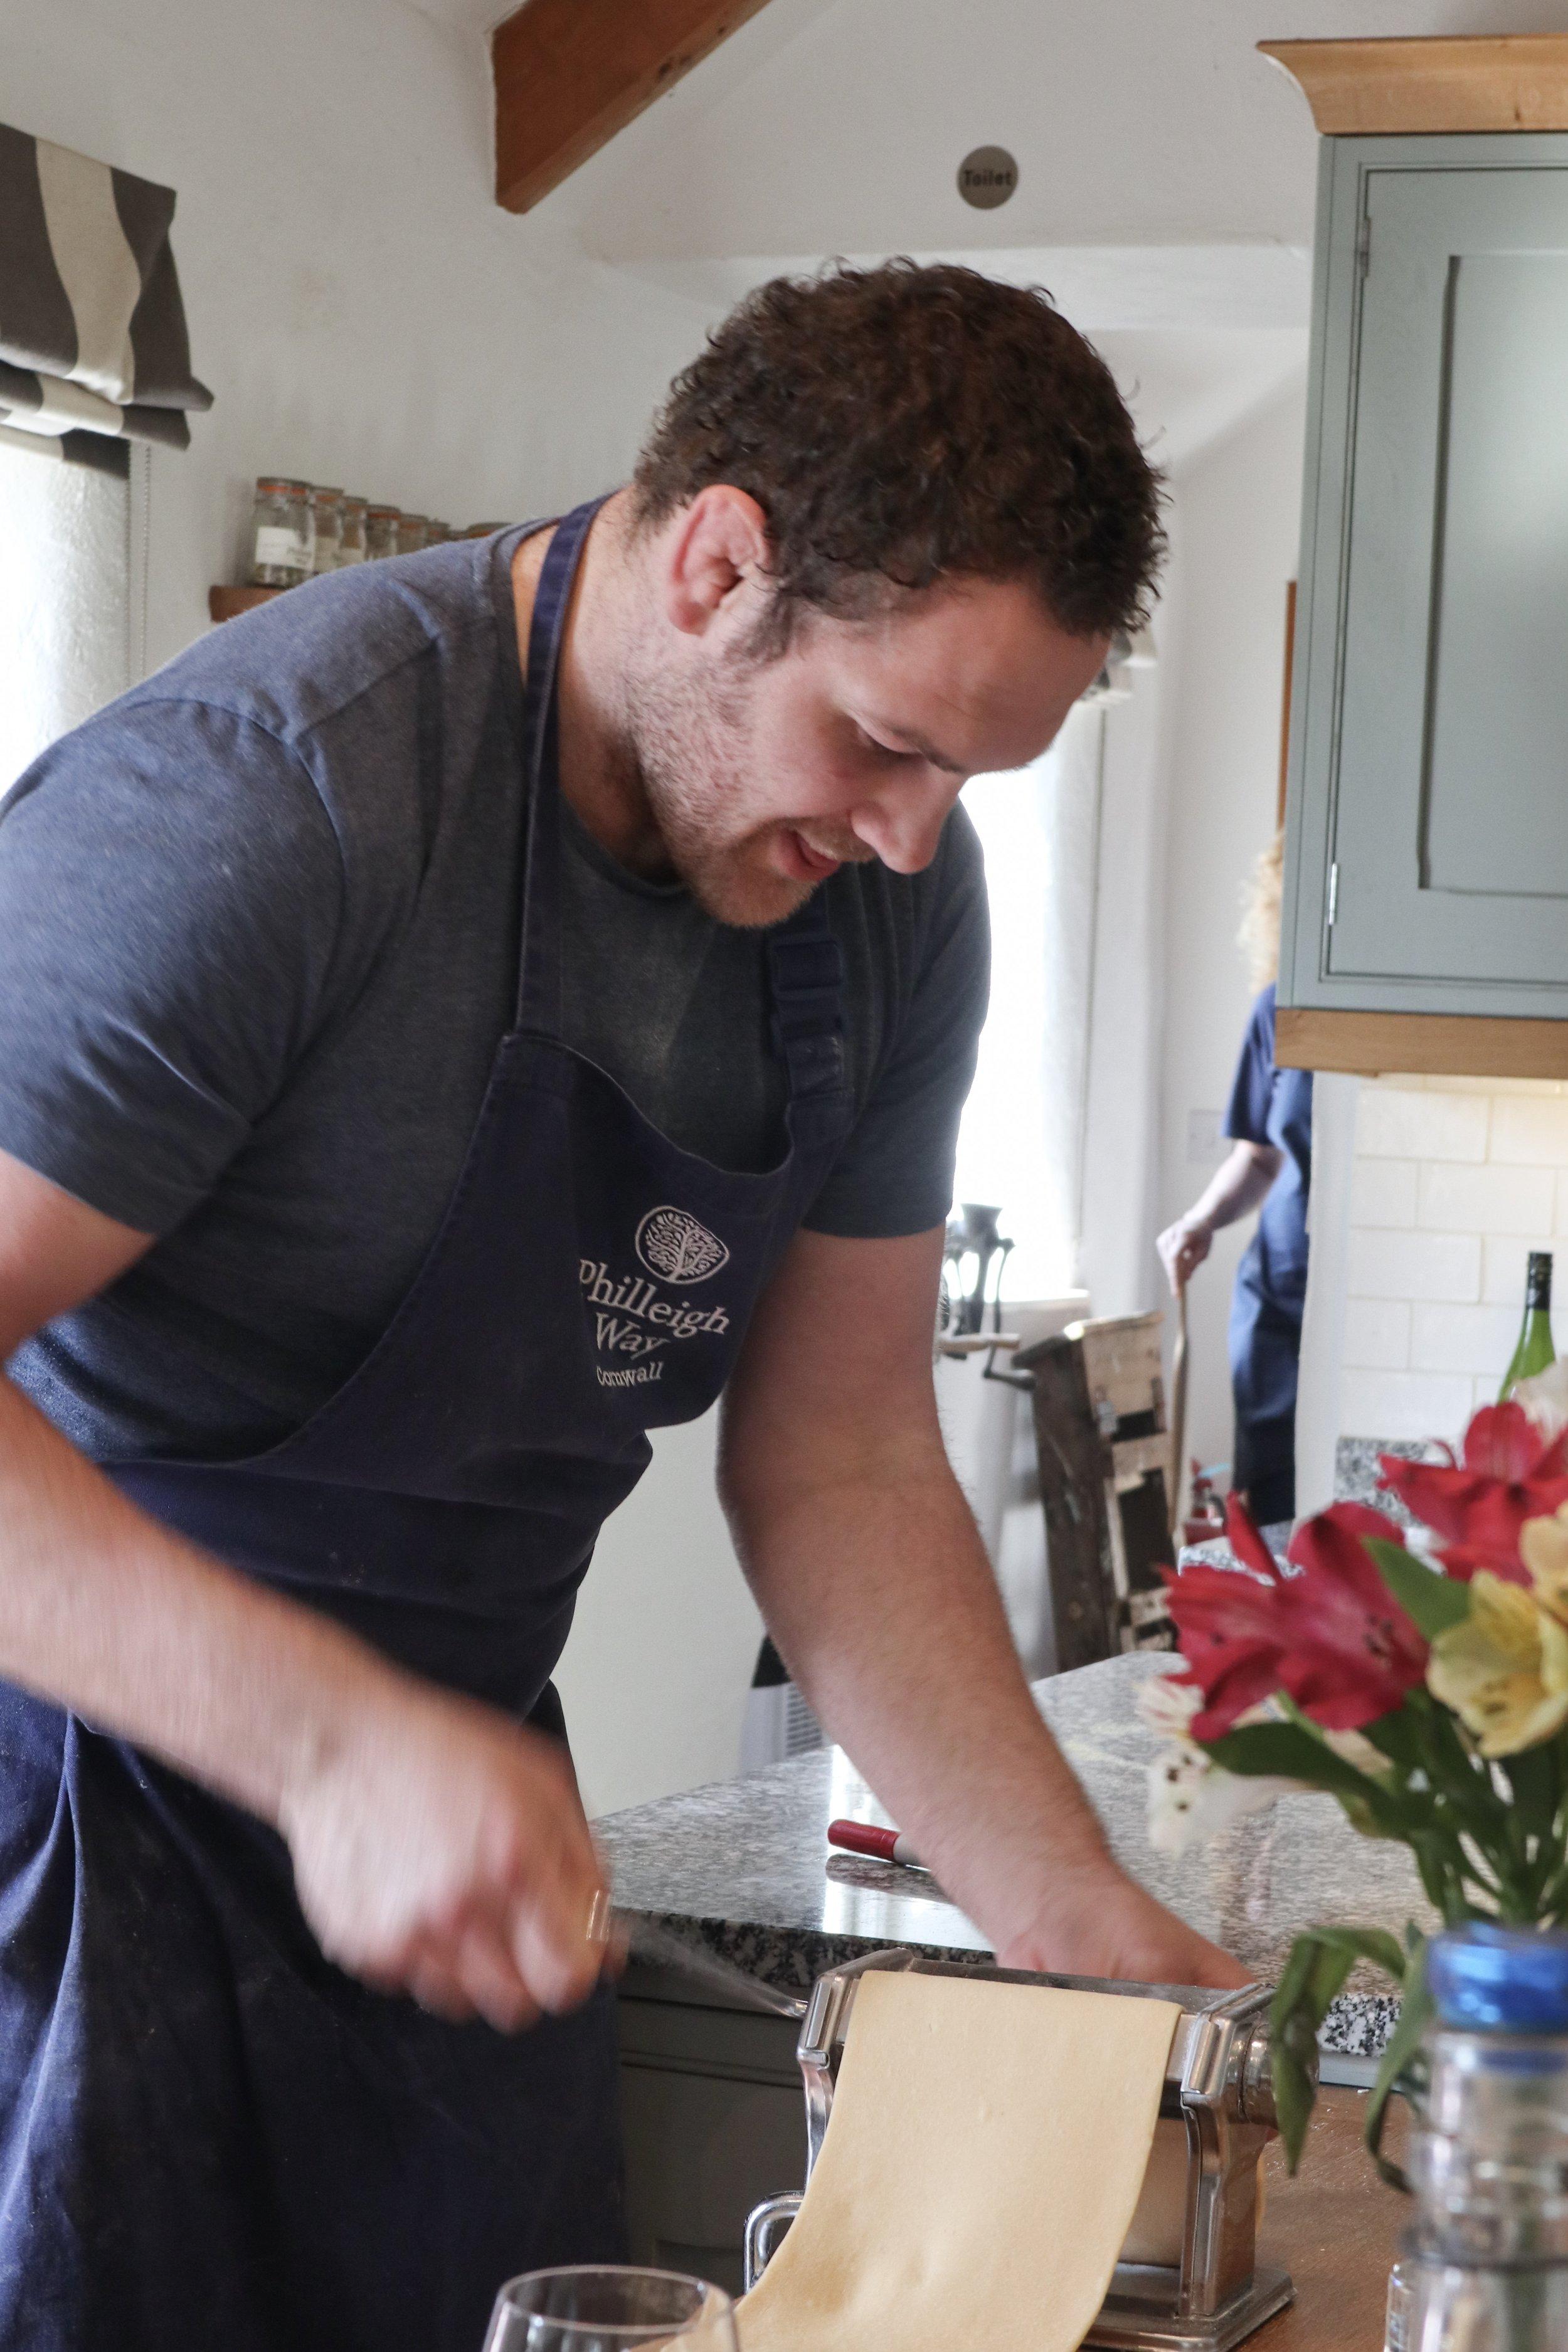 Rupert making pasta